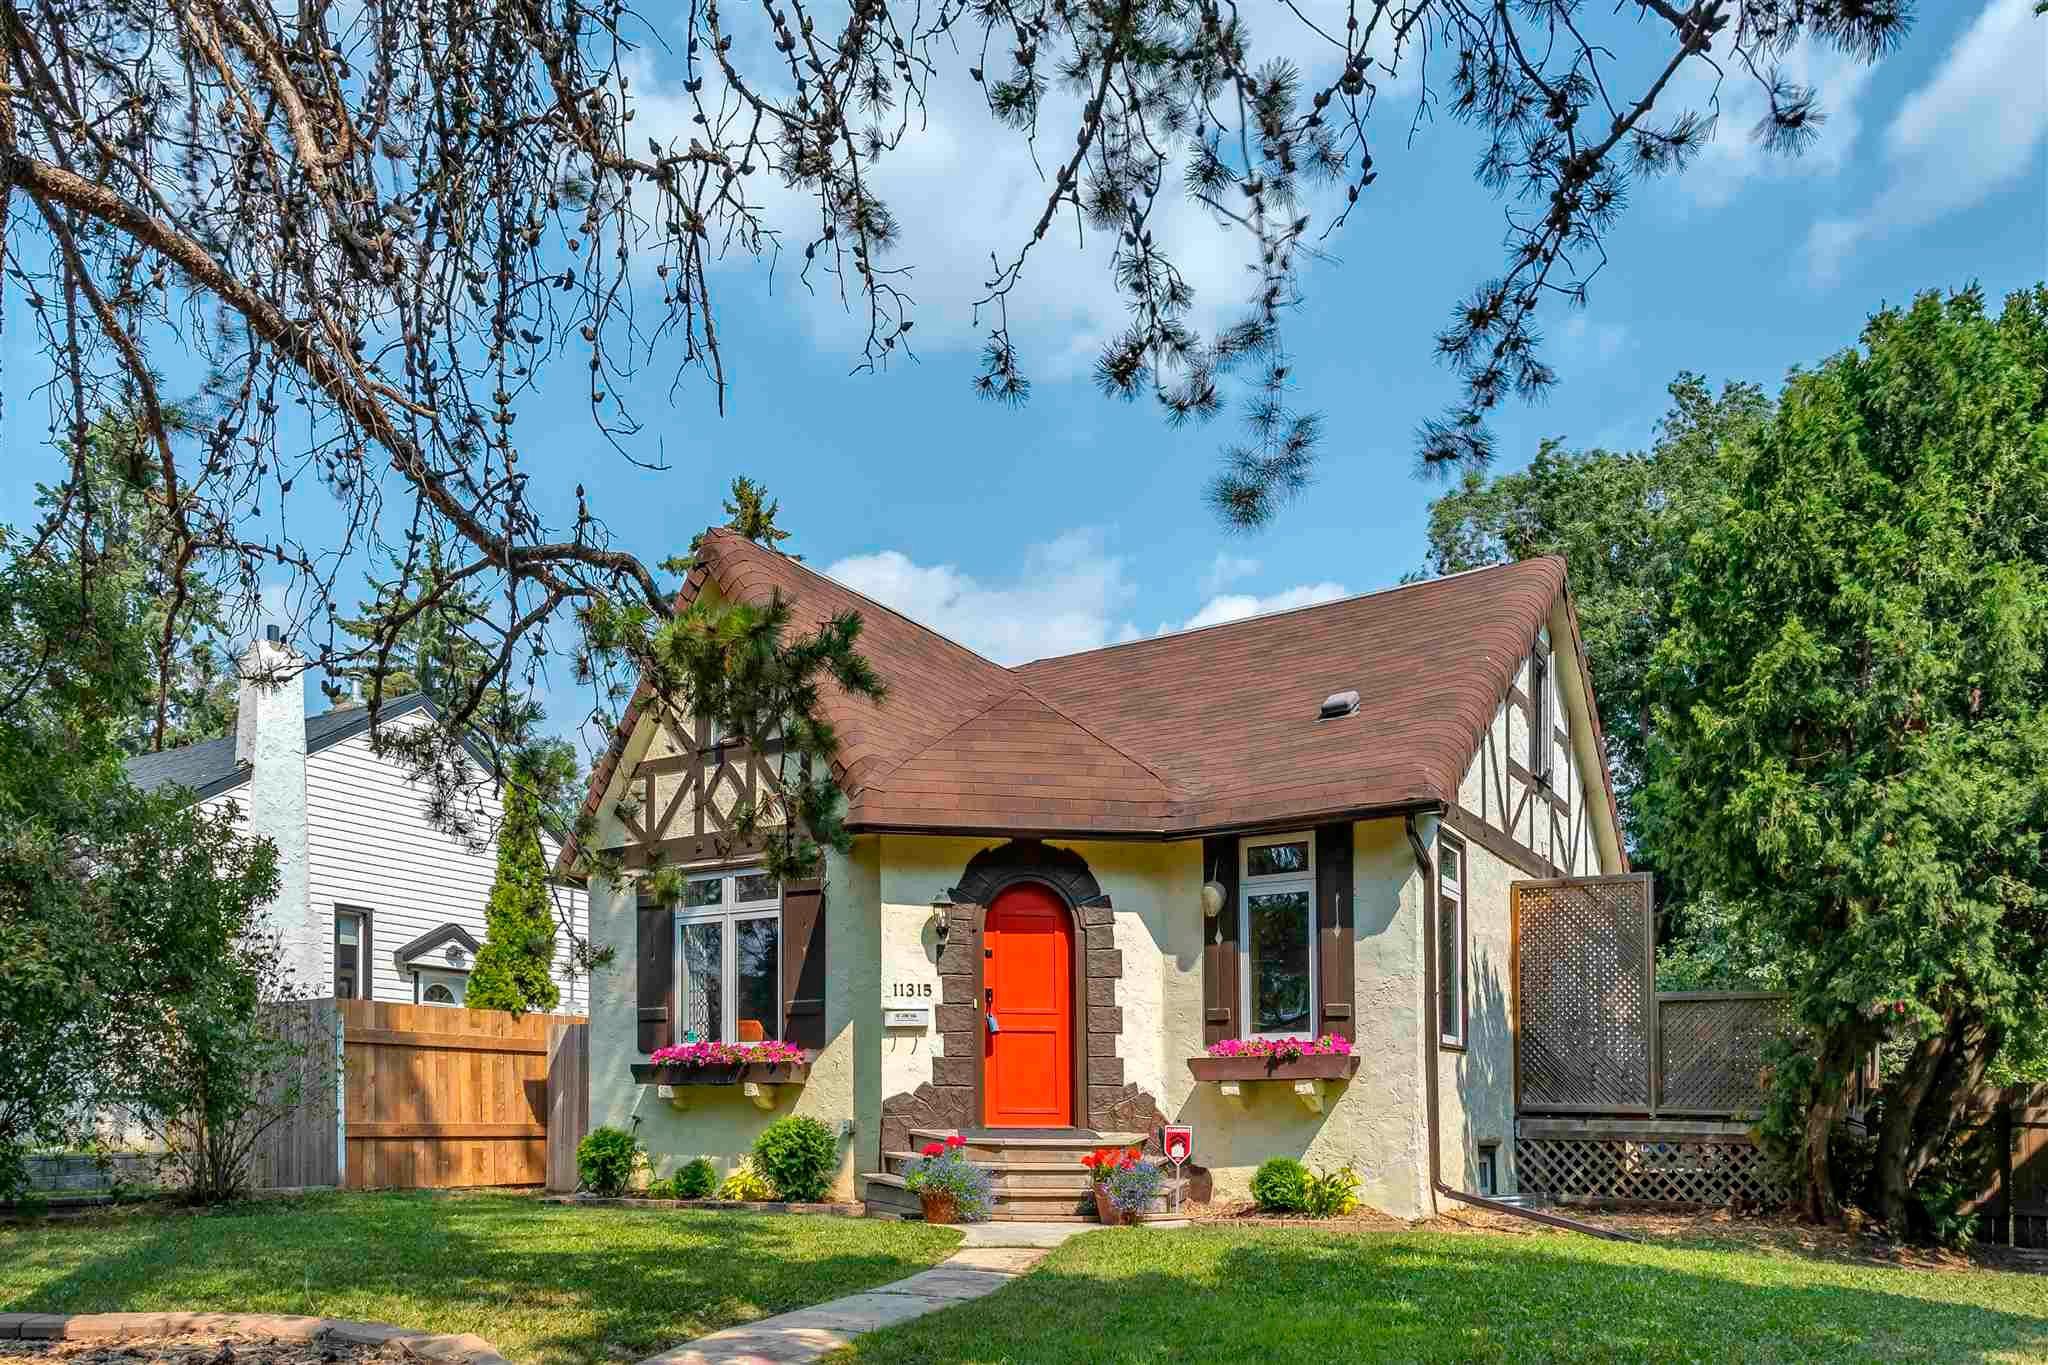 Main Photo: 11315 125 Street in Edmonton: Zone 07 House for sale : MLS®# E4265481